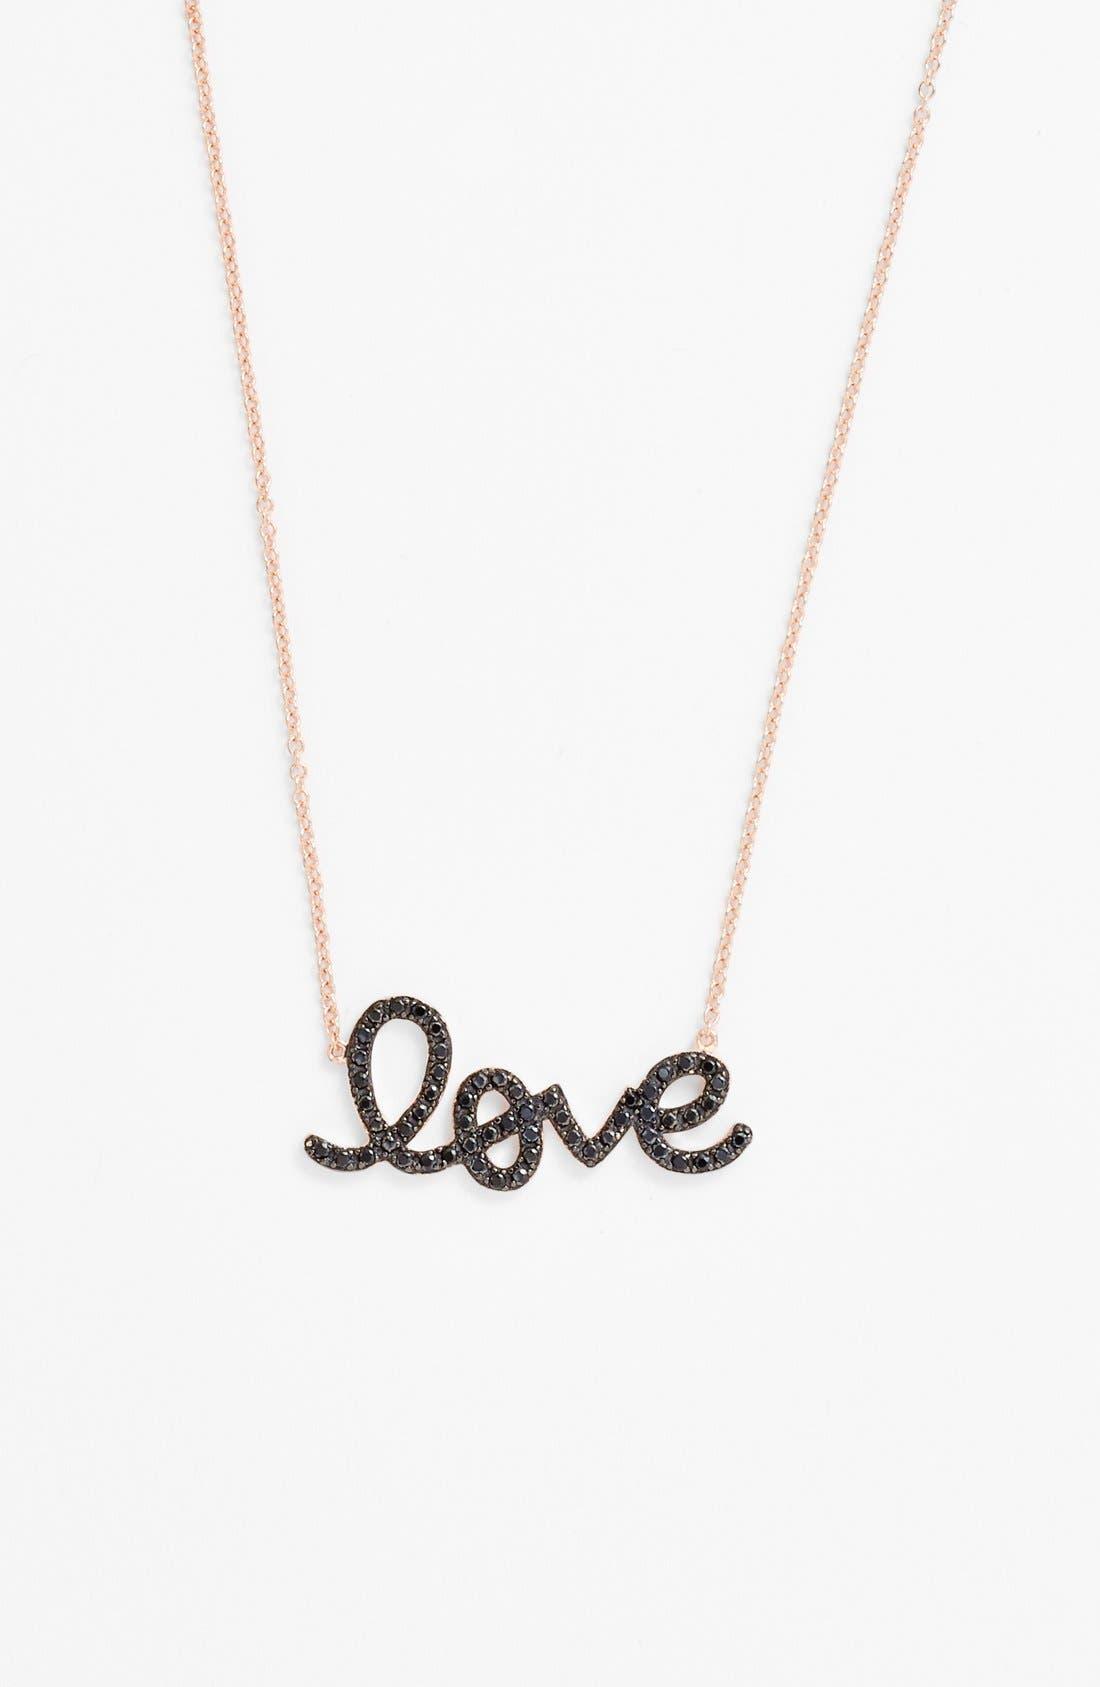 Alternate Image 1 Selected - Sugar Bean Jewelry 'Love' Pendant Necklace